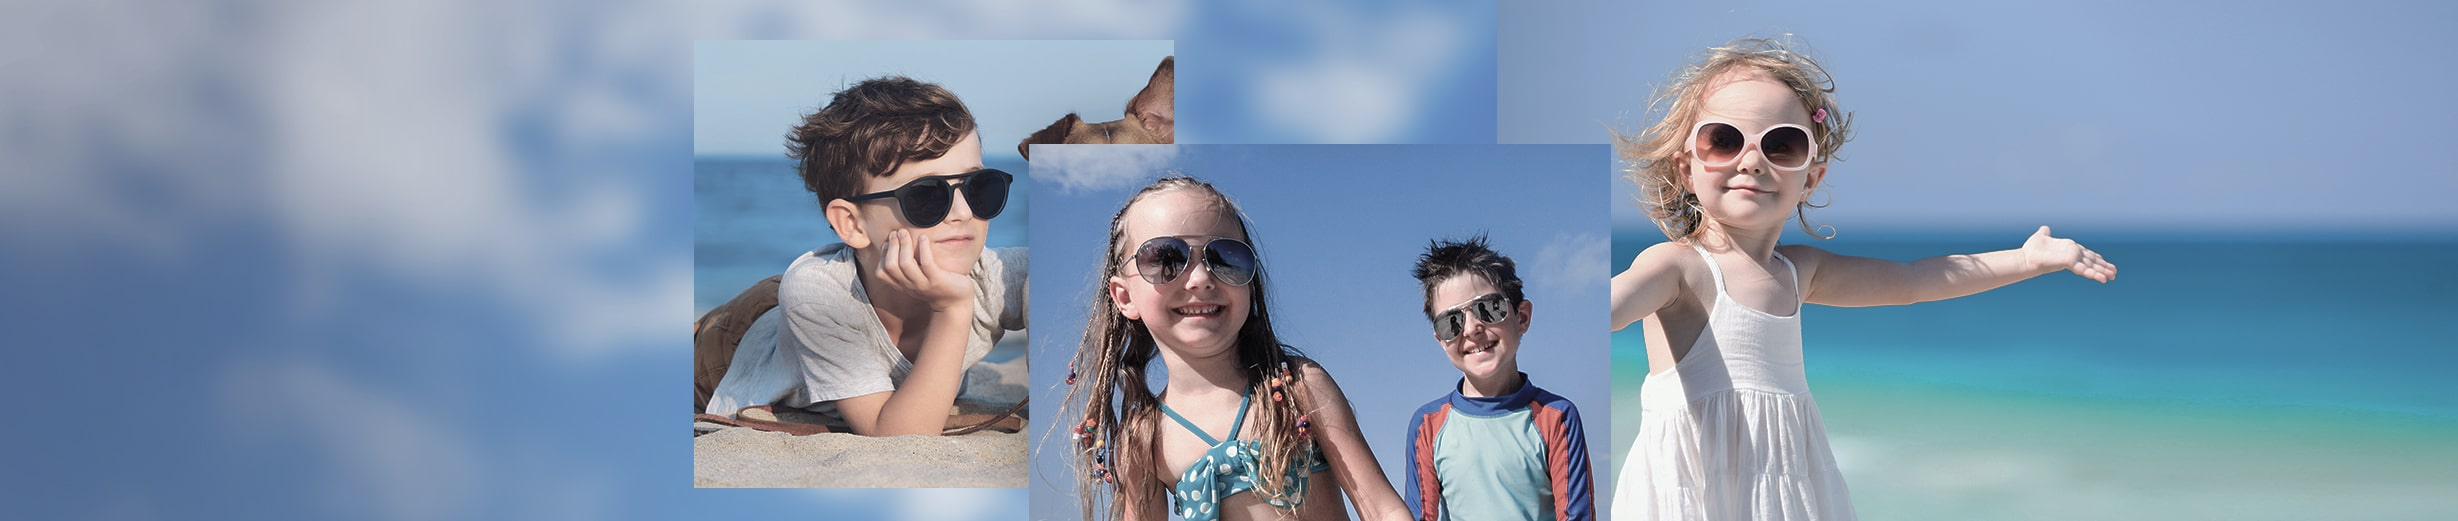 Glassesgallery - 兒童太陽鏡